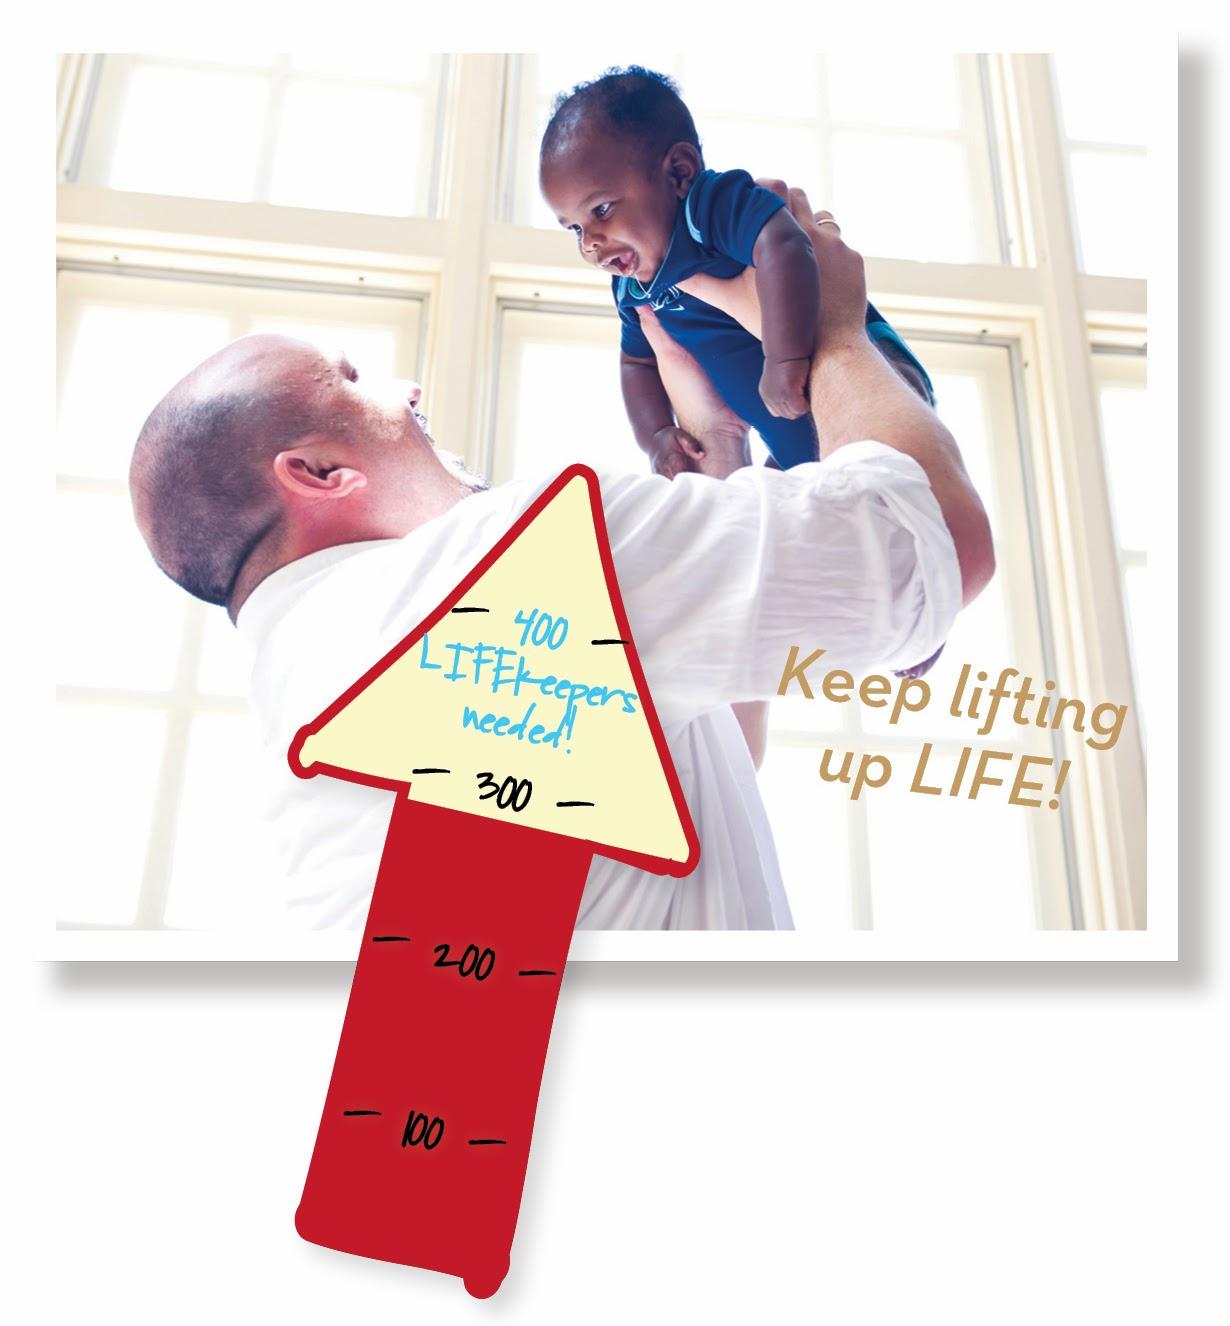 Keep lifting up LIFE!